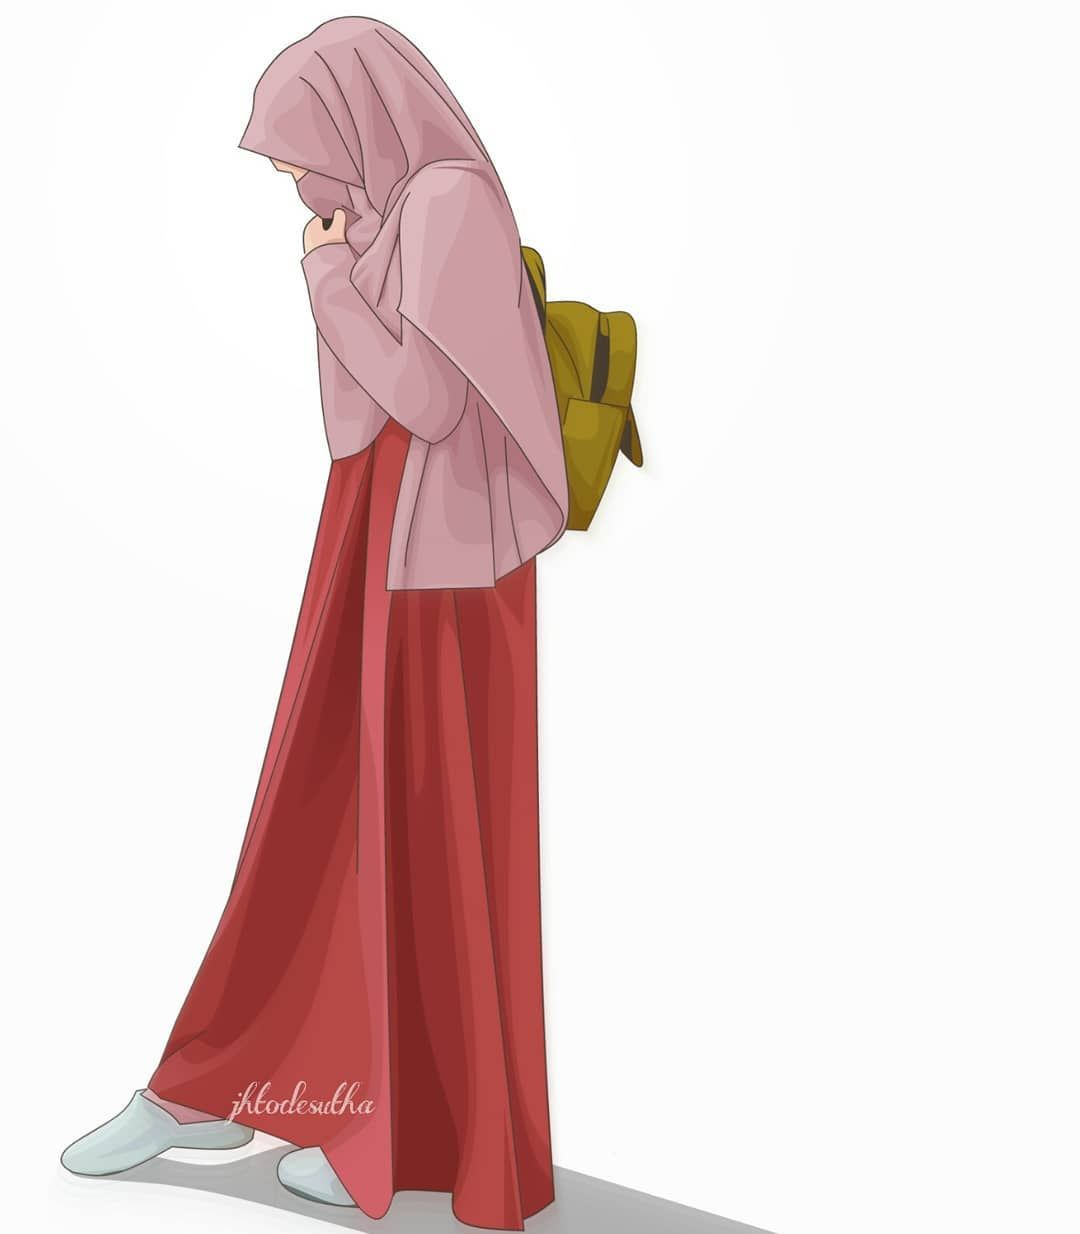 Gambar Pejuang Islam Wanita